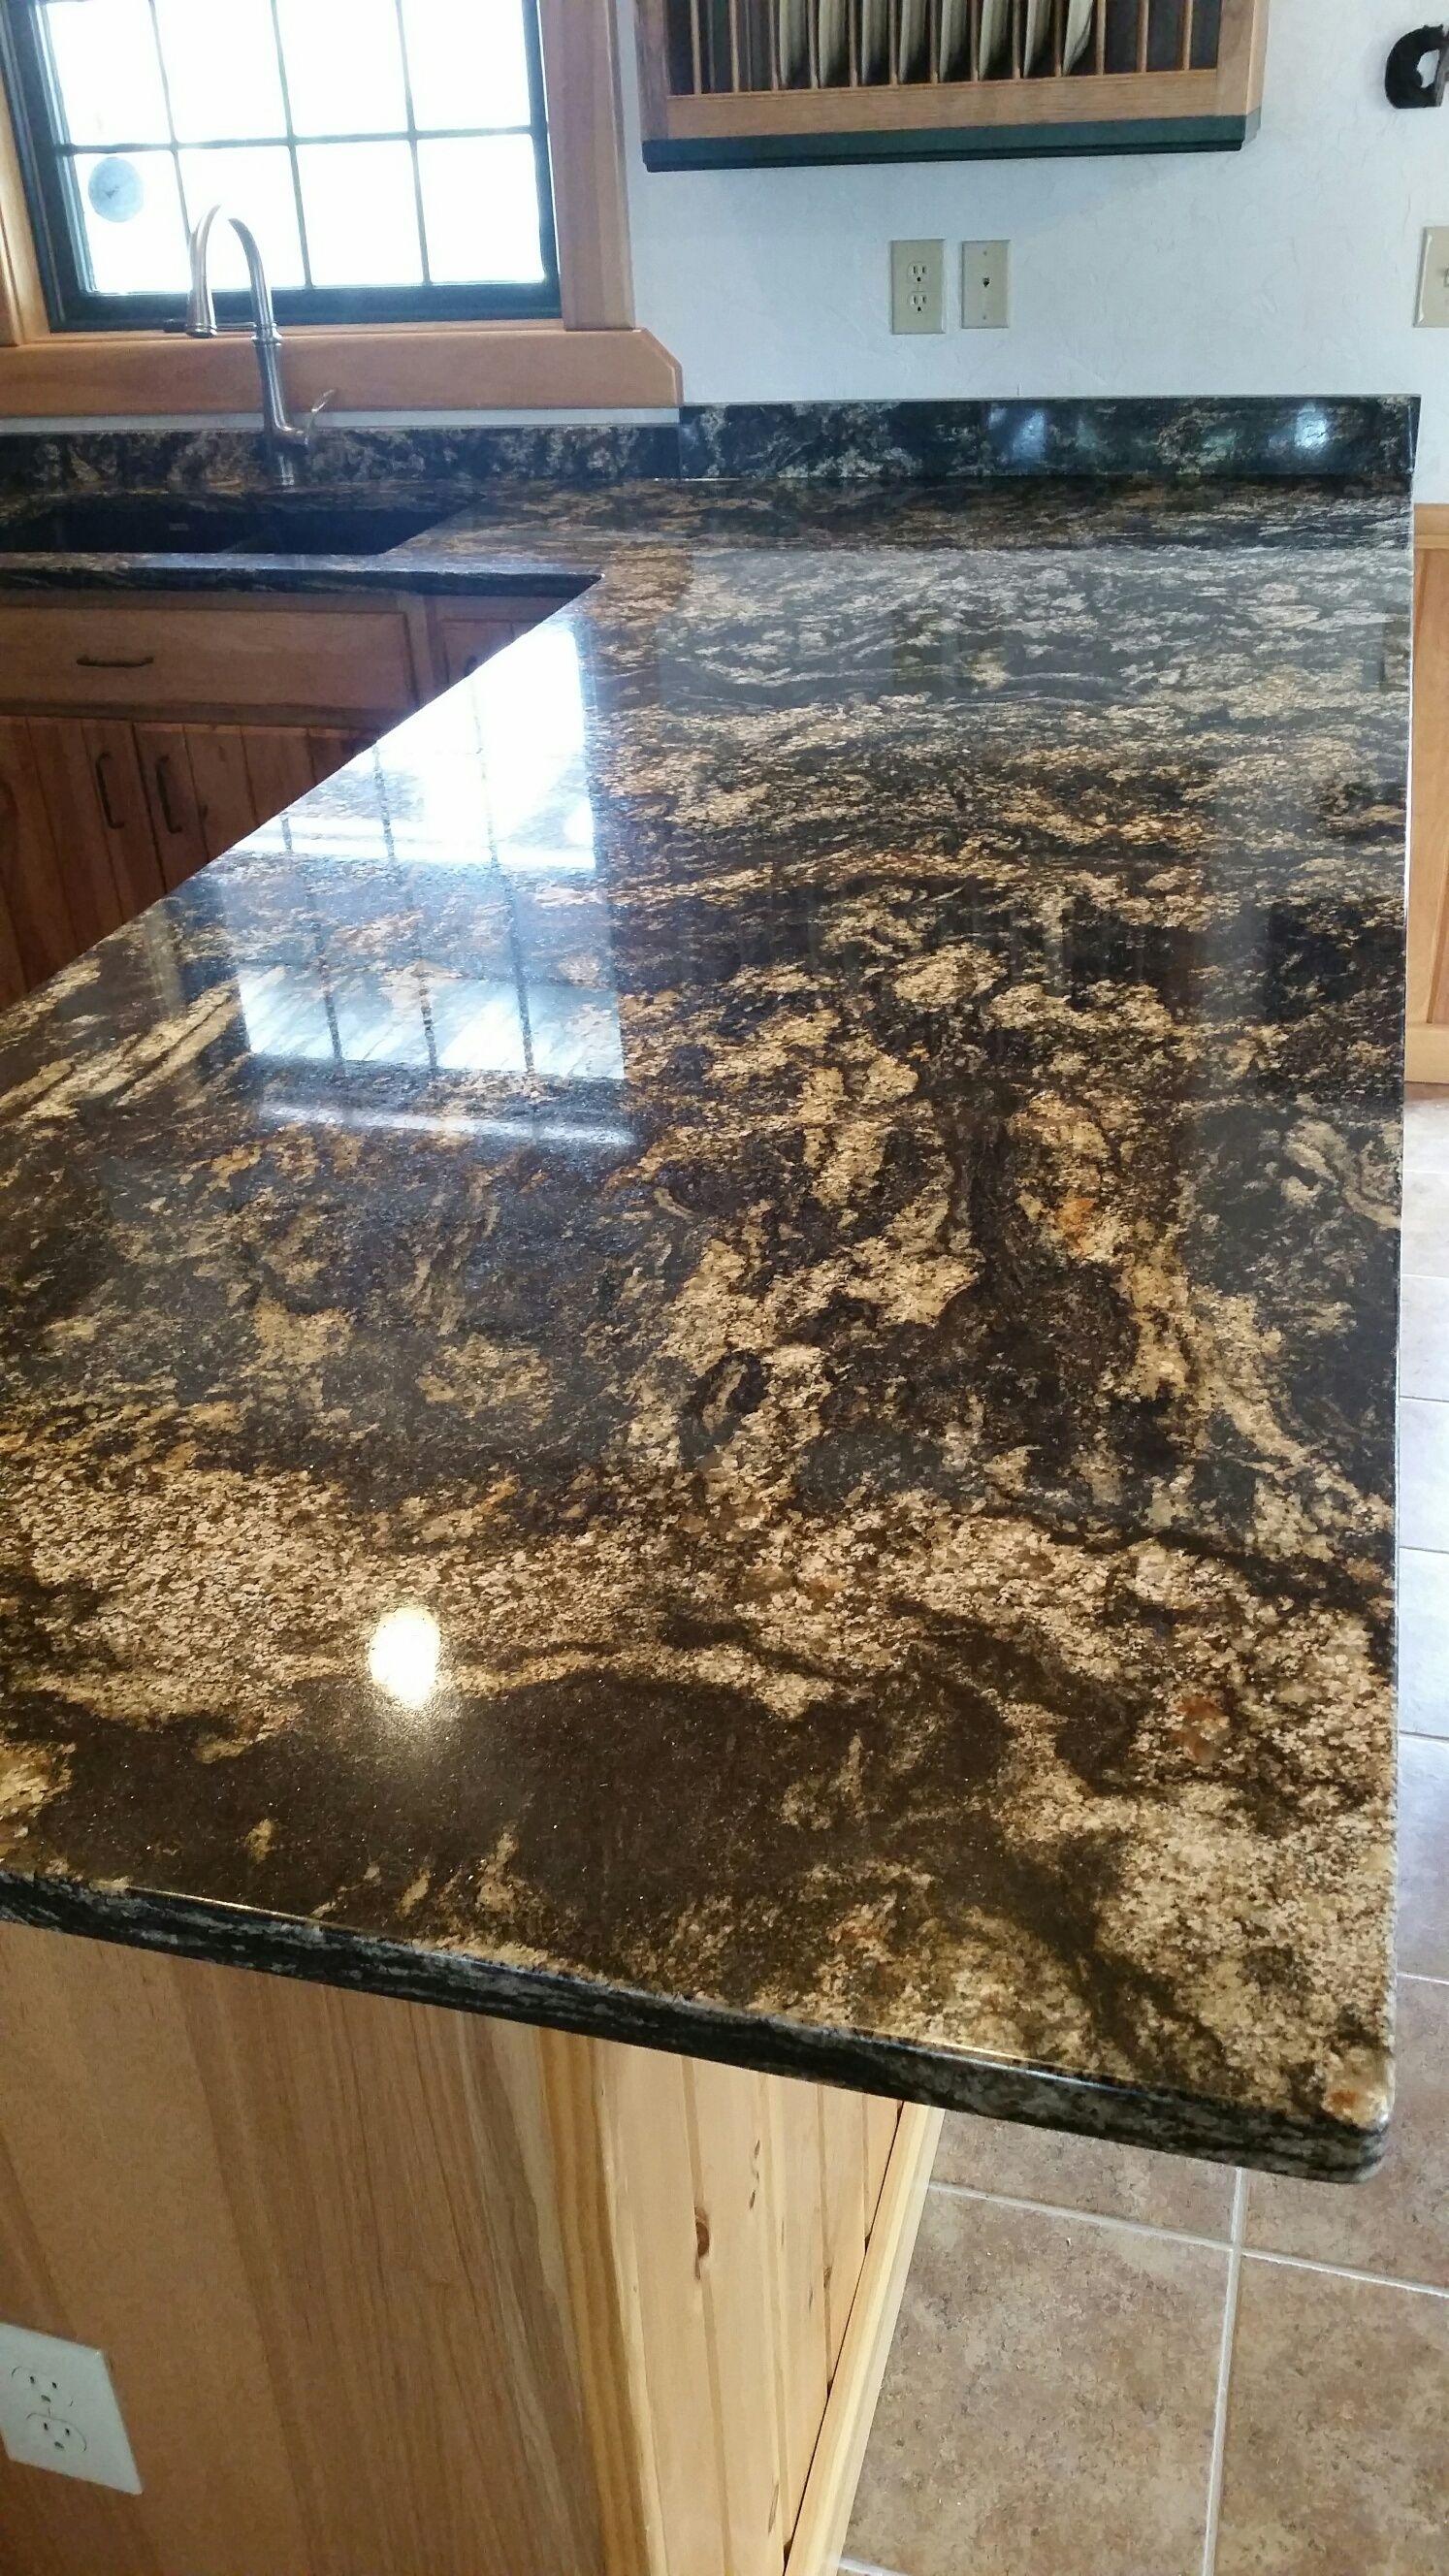 Kitchen Update Install Shots With Brisbane Gold Granite Granite Gold Movement Remodel Update Kitchen Updated Kitchen Kitchen Installation Granite